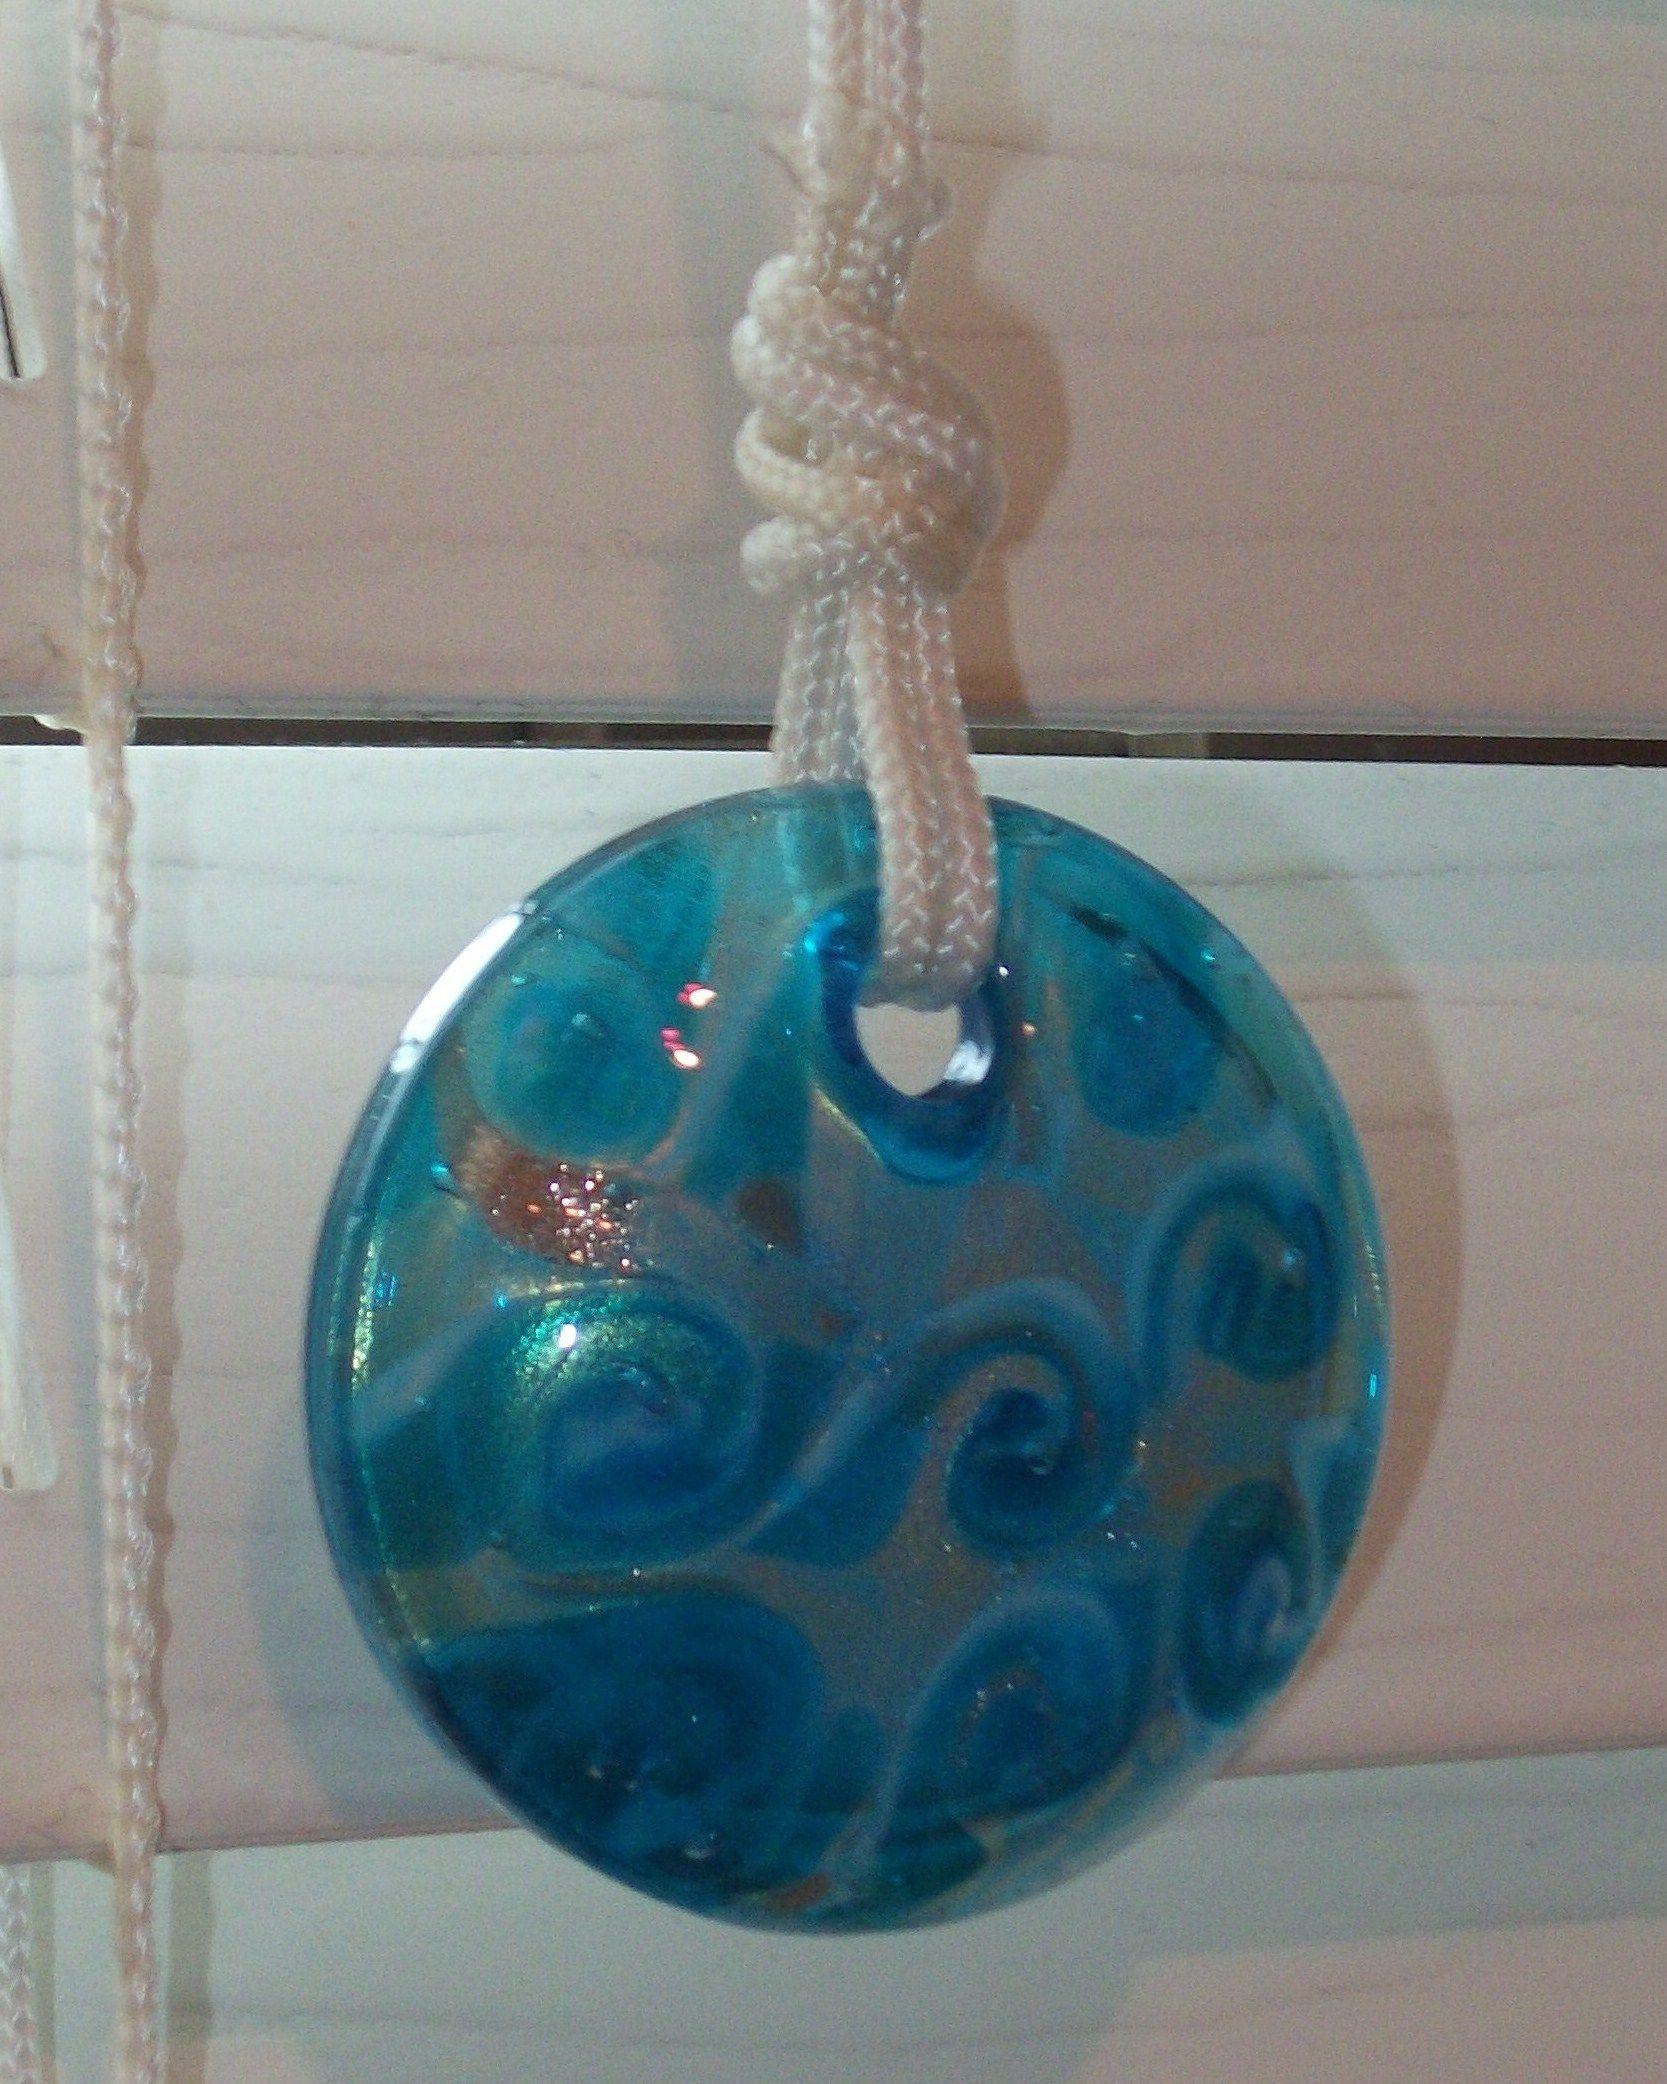 Glass bead for blind pull cord bathroom light pulls